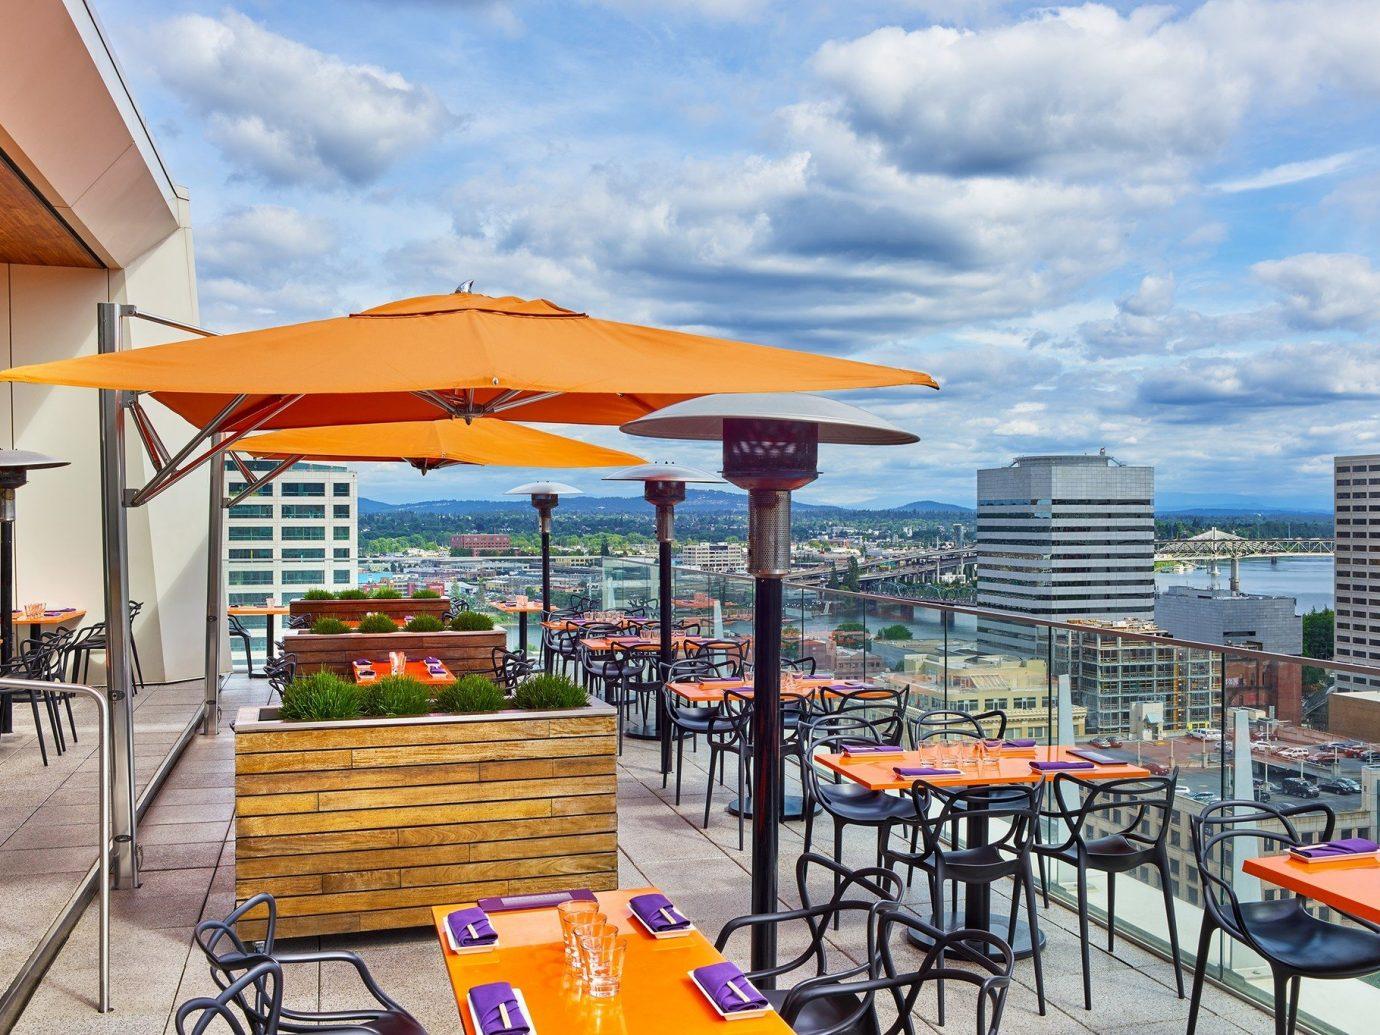 Food + Drink sky outdoor chair leisure property Resort restaurant vacation real estate plaza condominium orange furniture